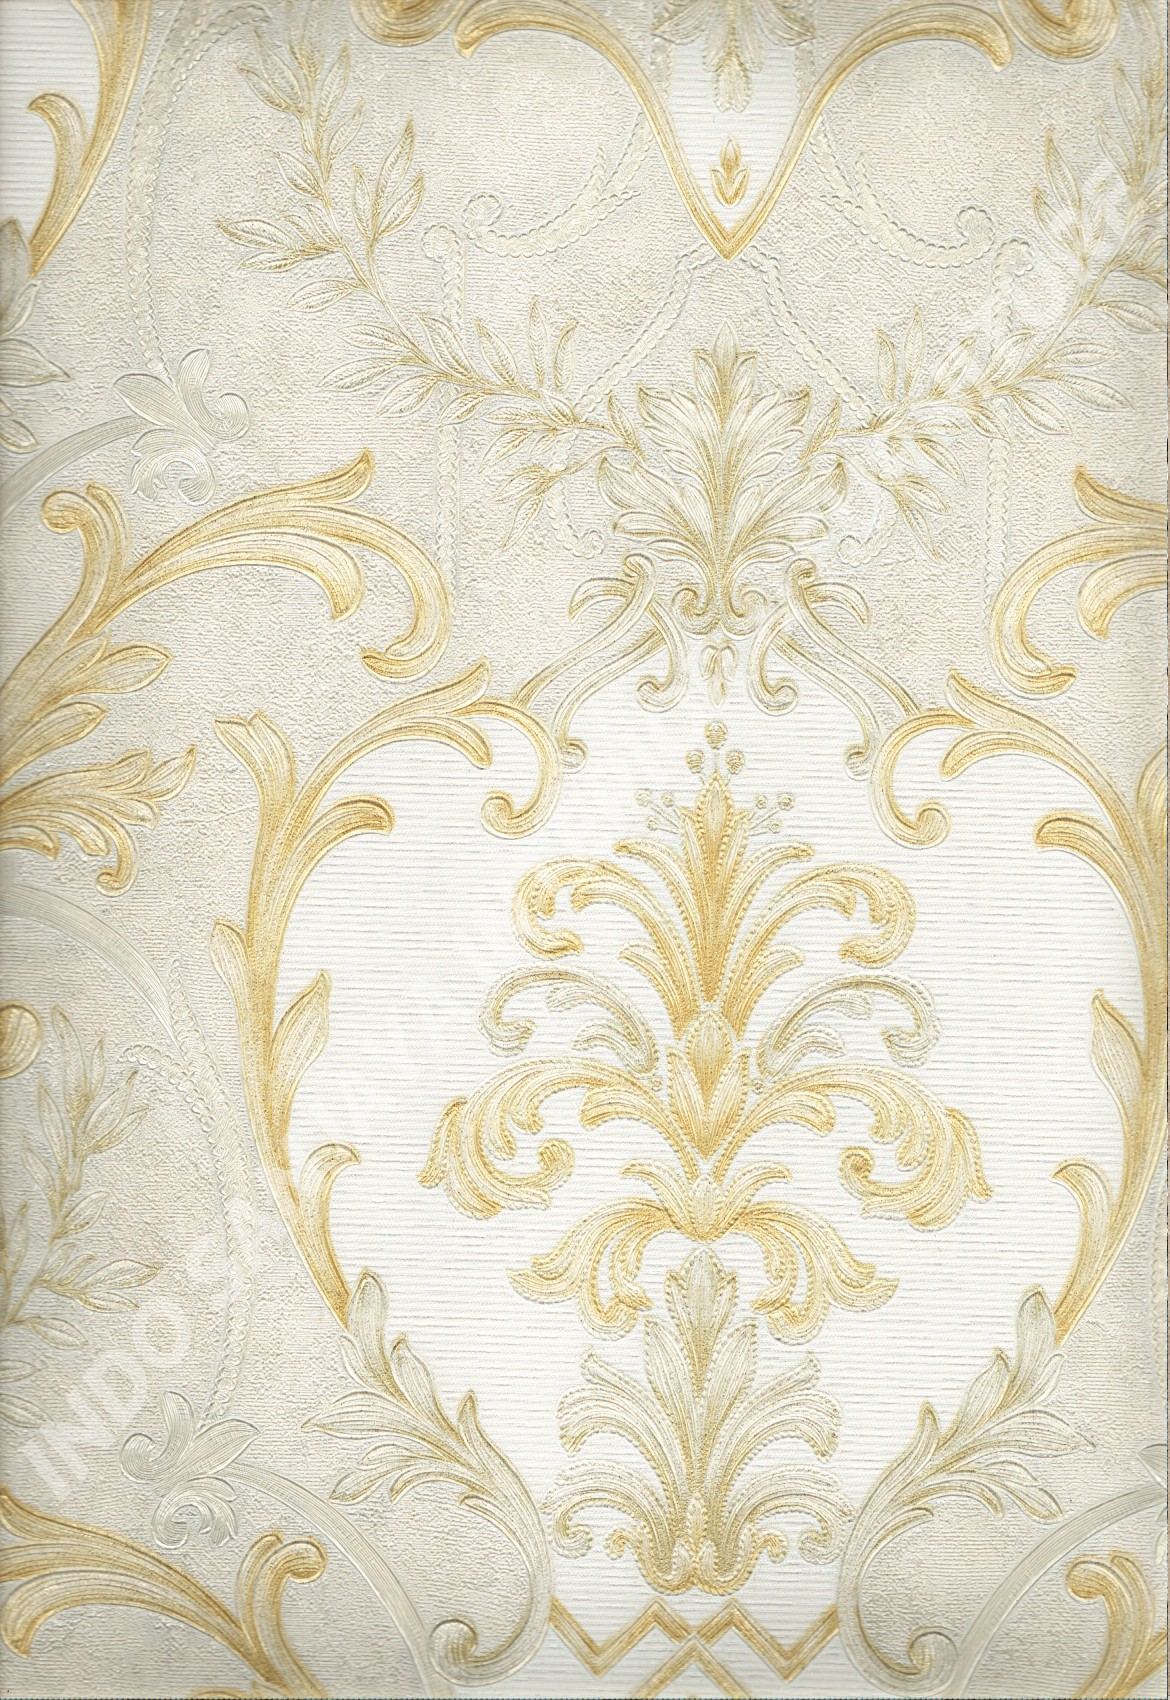 wallpaper   Wallpaper Klasik Batik (Damask) DL11002:DL11002 corak  warna